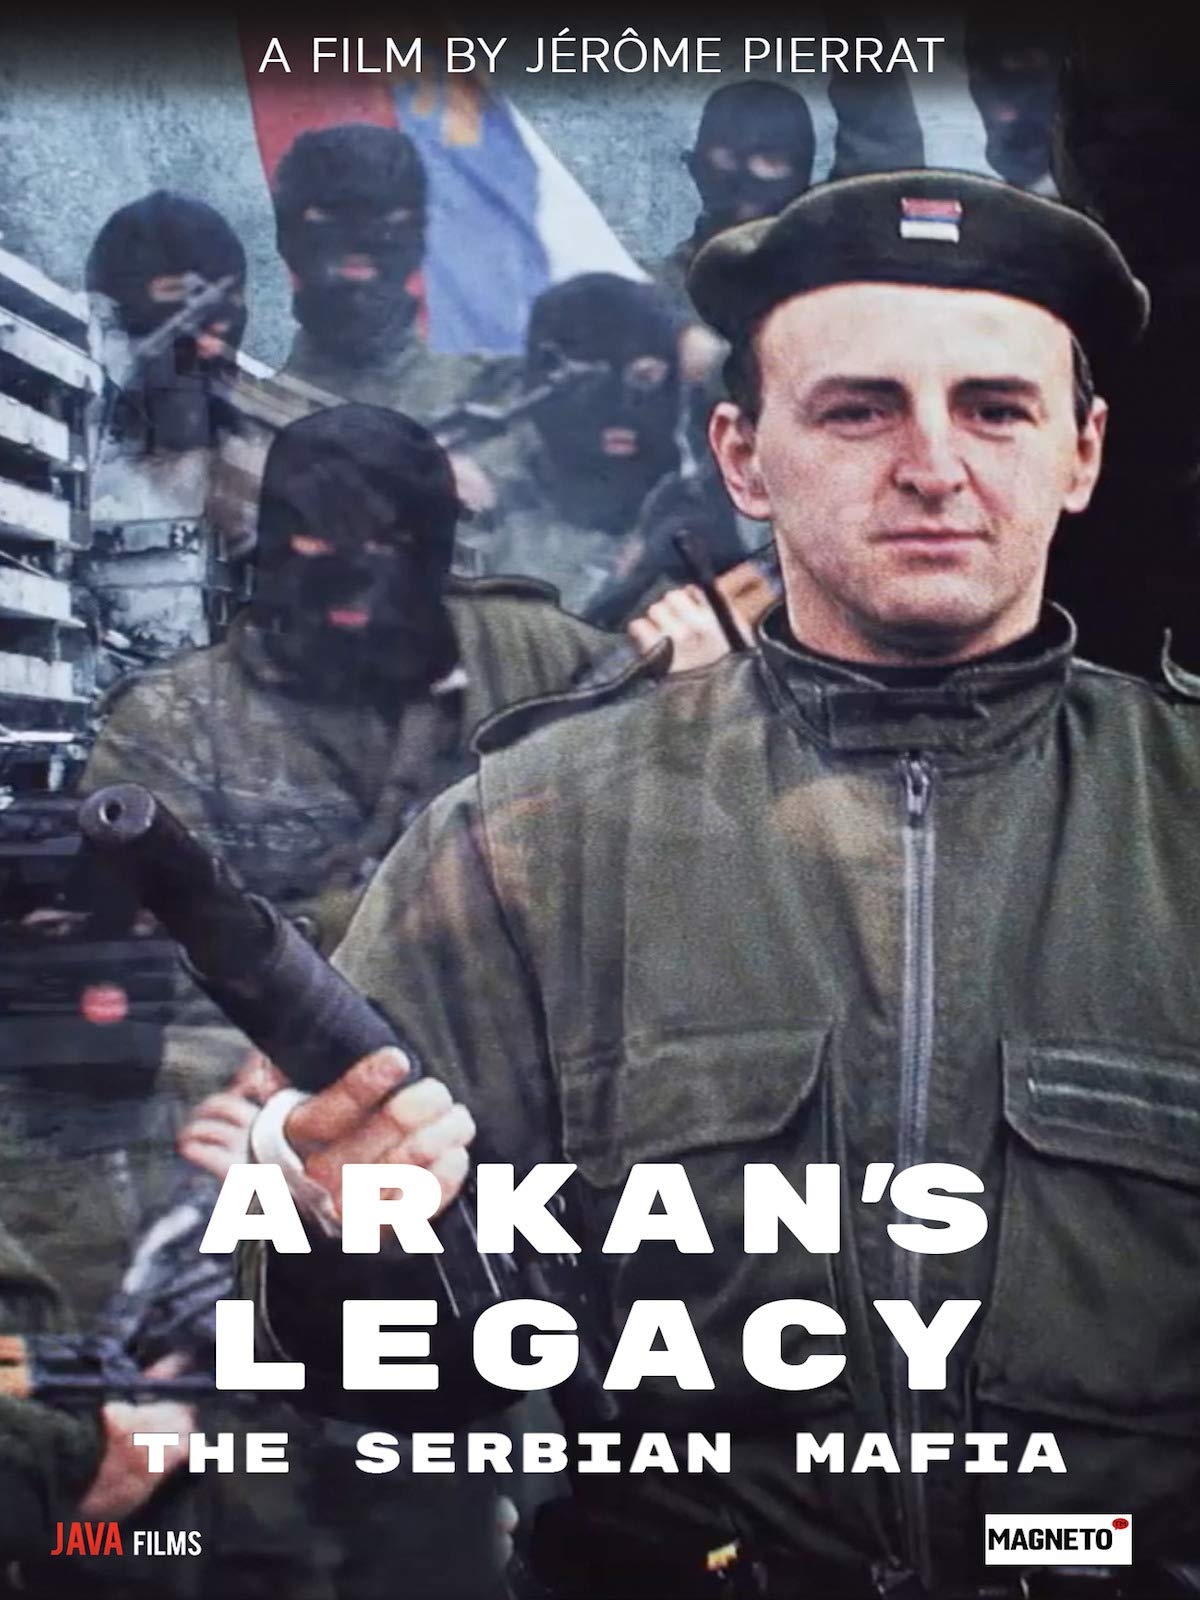 Arkan's Legacy: The Serbian Mafia